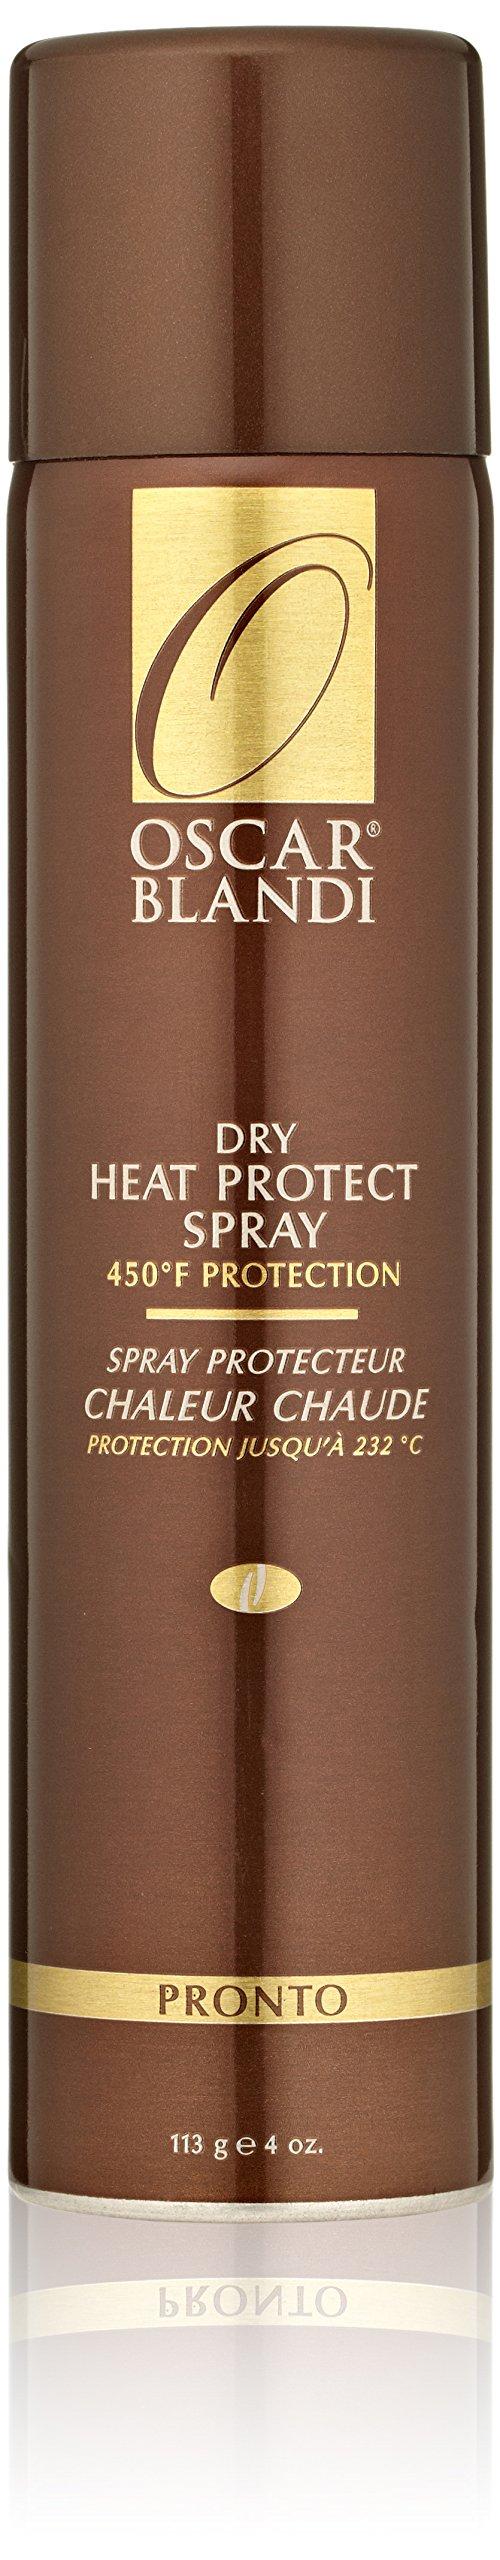 Oscar Blandi Pronto Dry Heat Protect Spray, 4 oz.